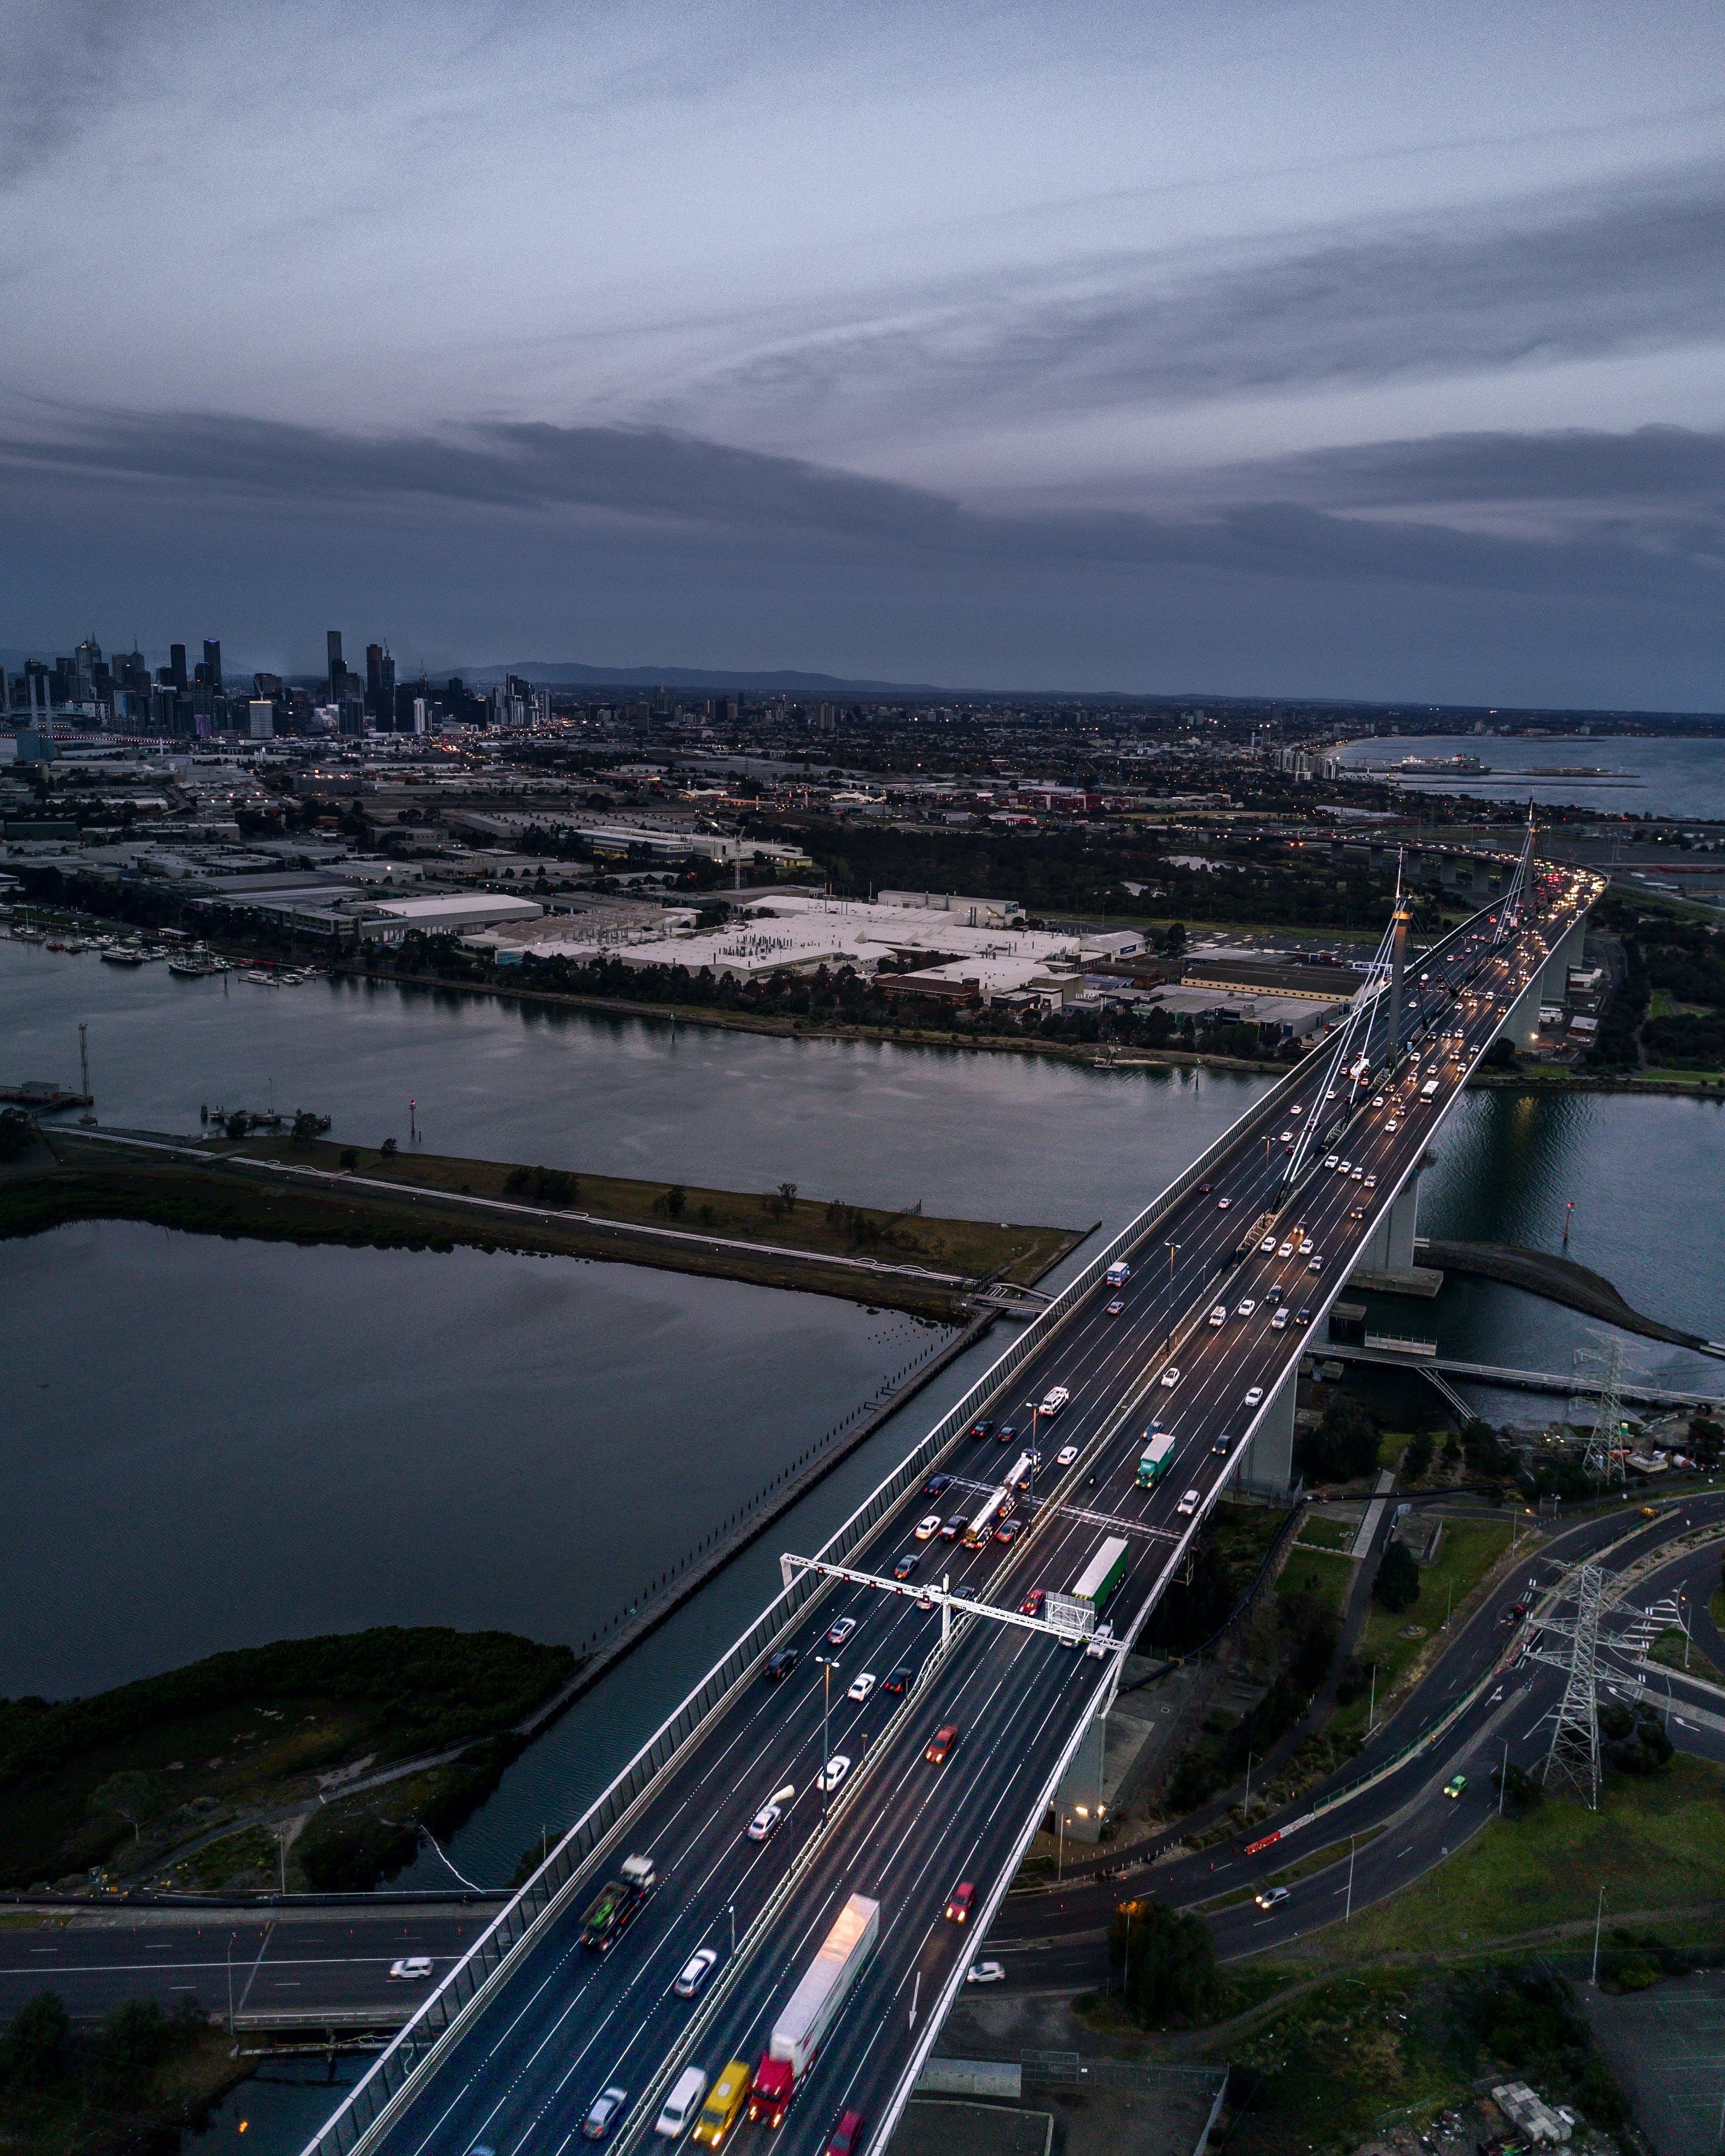 Fotos de stock gratuitas de arquitectura, autopista, carretera, coches